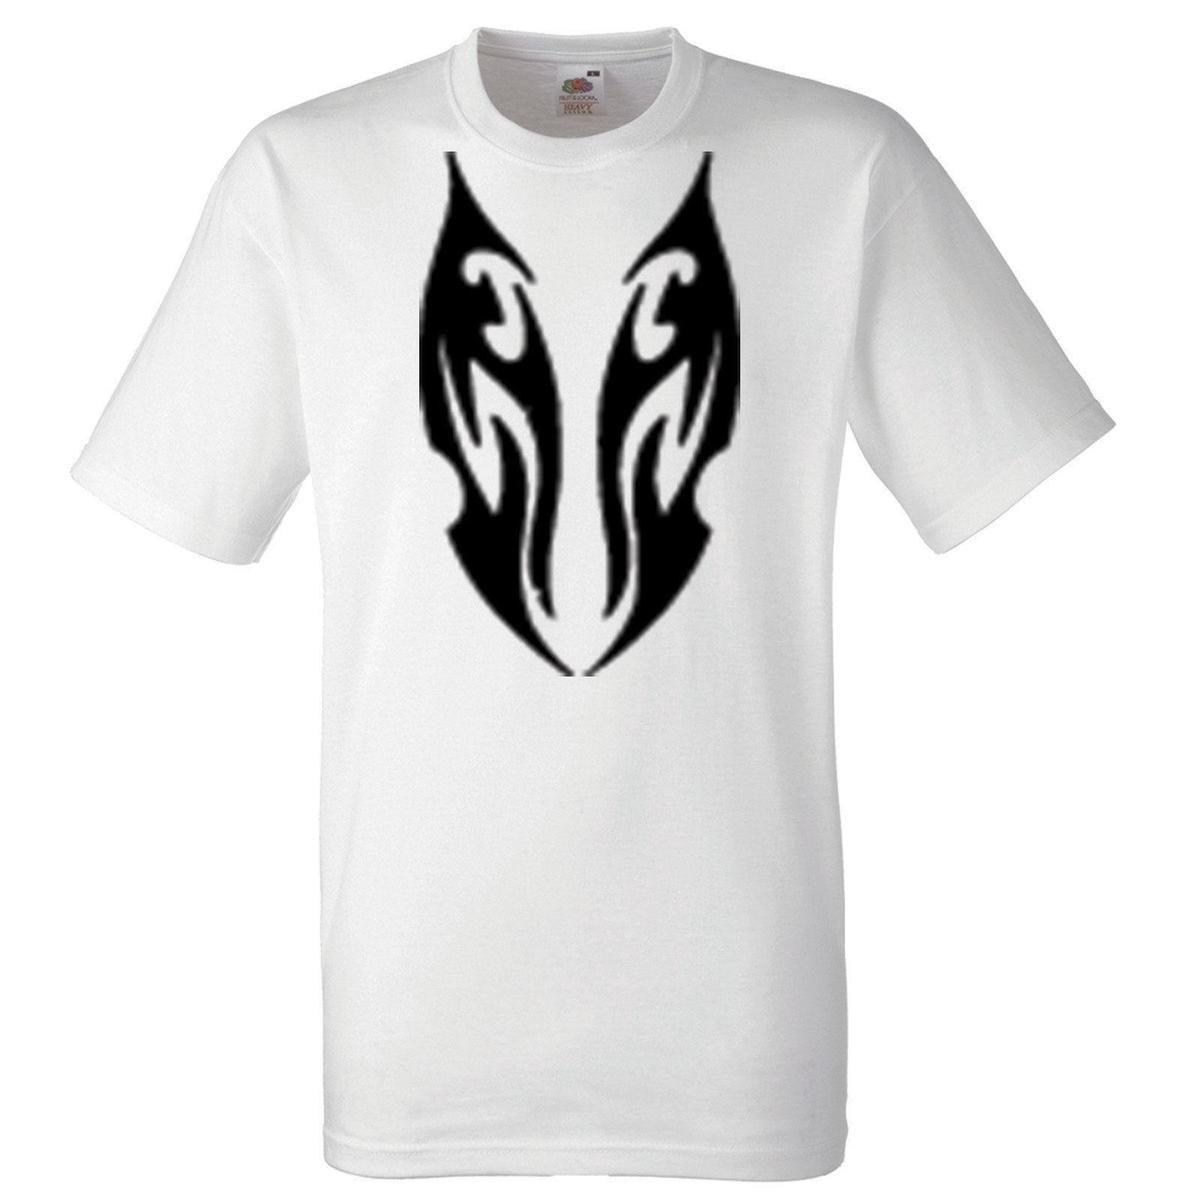 3a4fdf14 TRIBAL T SHIRT DESIGN SERIES TATTOO STYLE TEE WHITE SHIRT HIPSTER 2dis547  Free T Shirts T Shirts Deals From Zhangjingxin39, $15.53  DHgate.Com